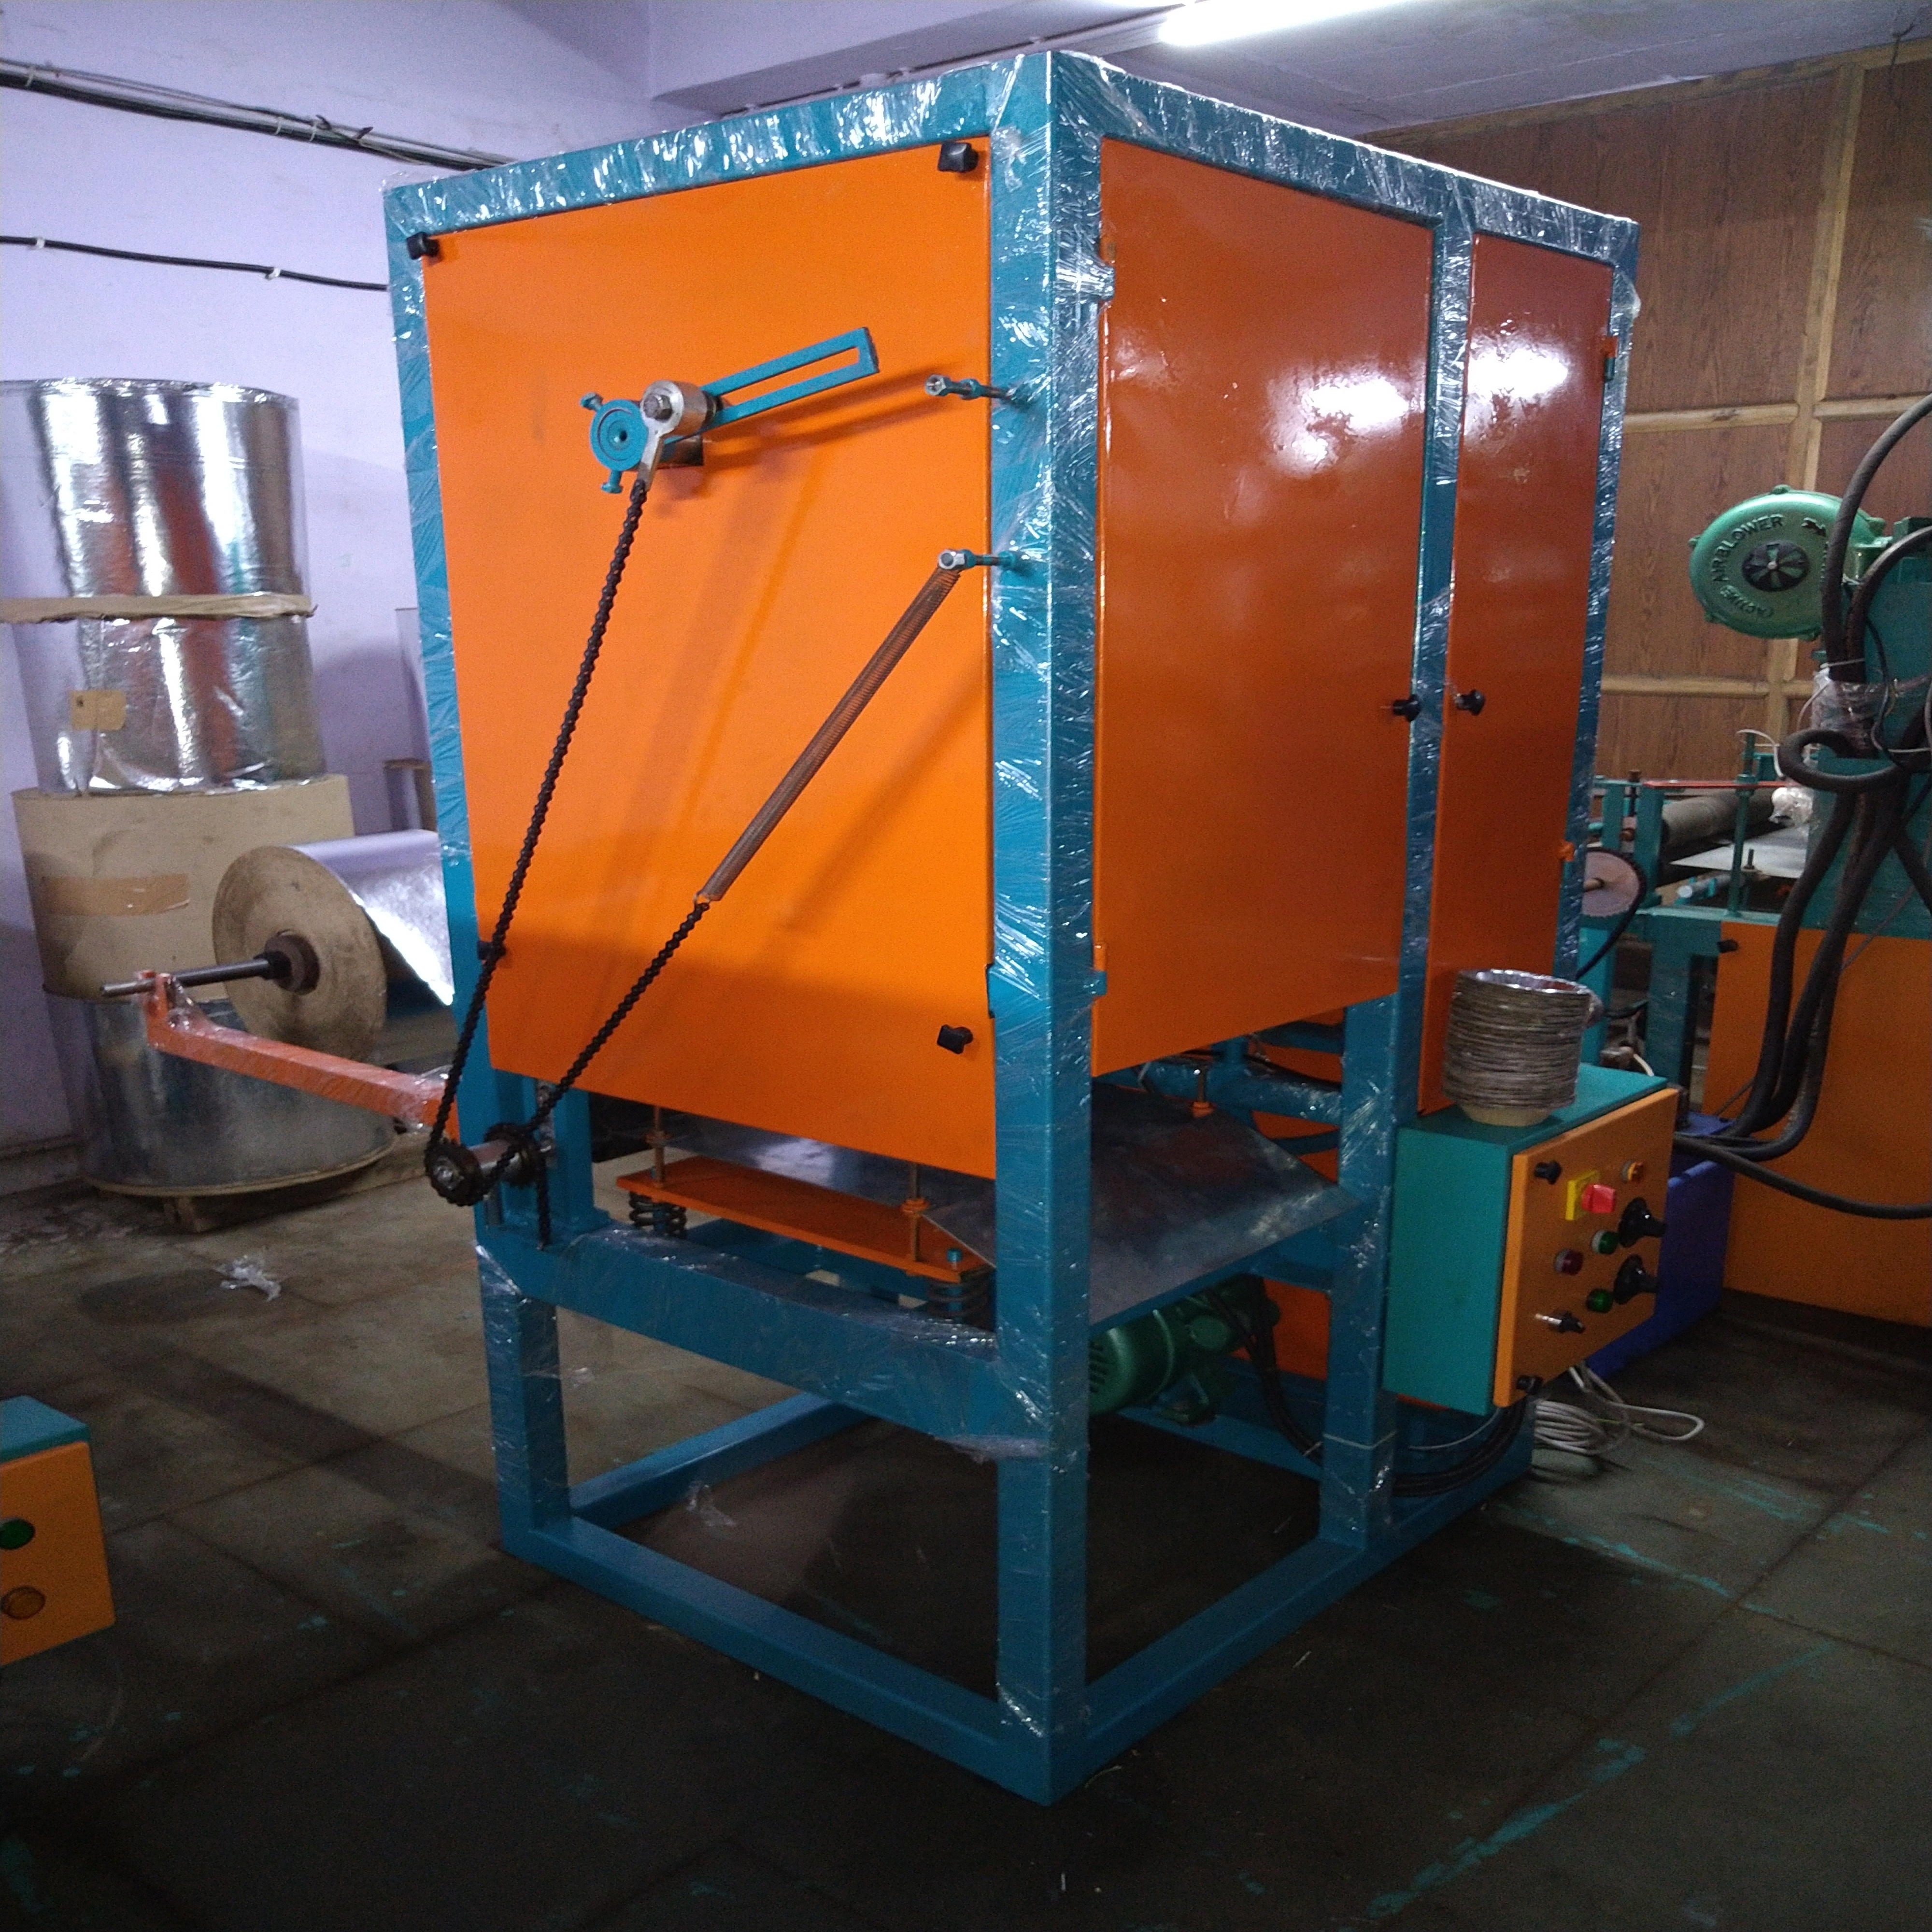 Single Die Disposable Plate Making Machine